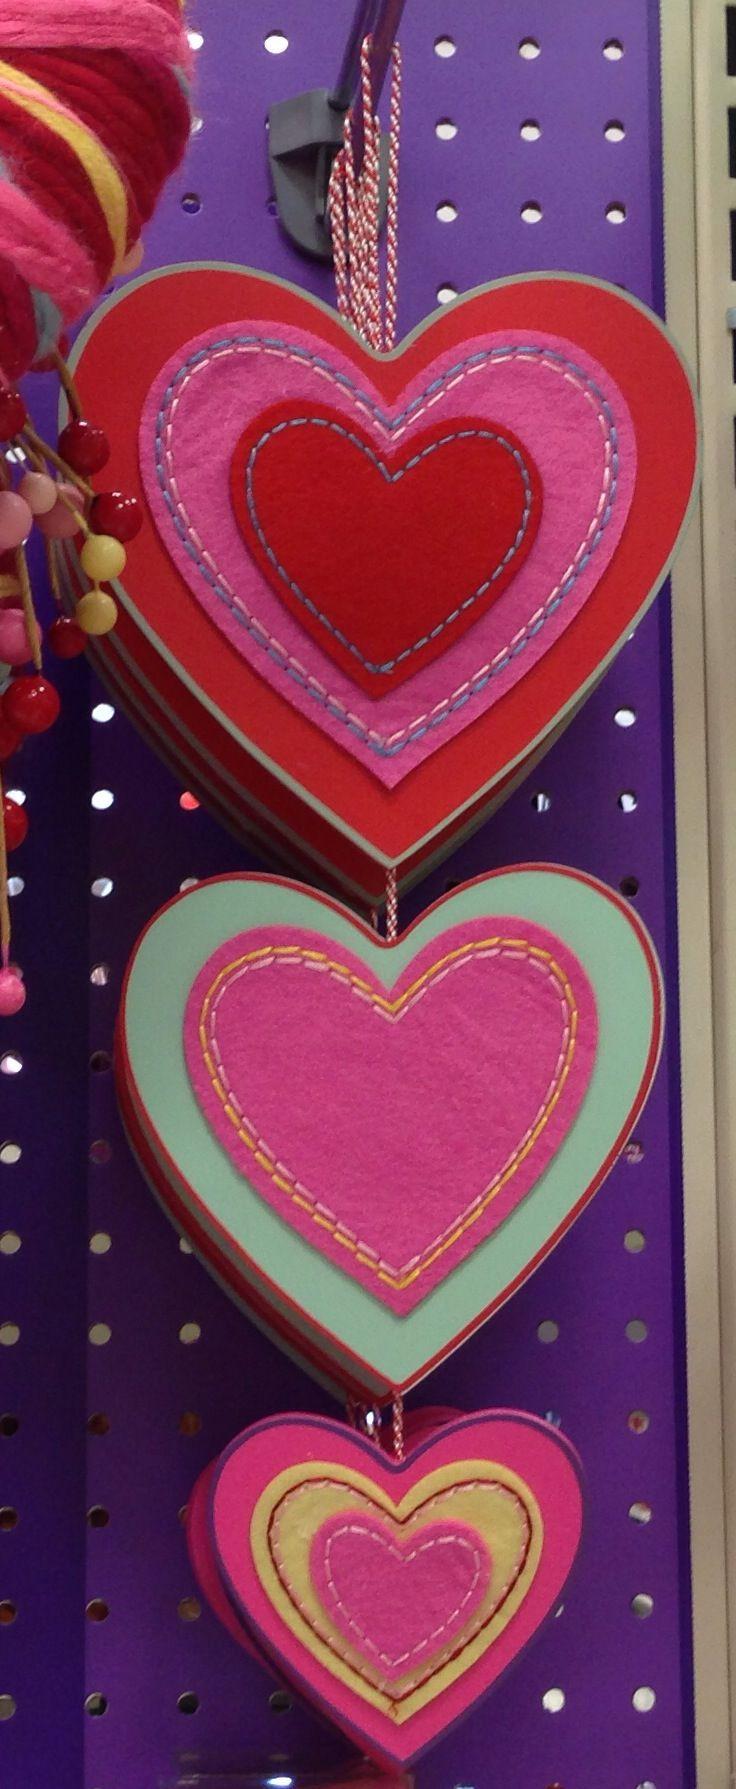 Valentine decor target colorful hearts valentines for Pinterest valentine home decorations